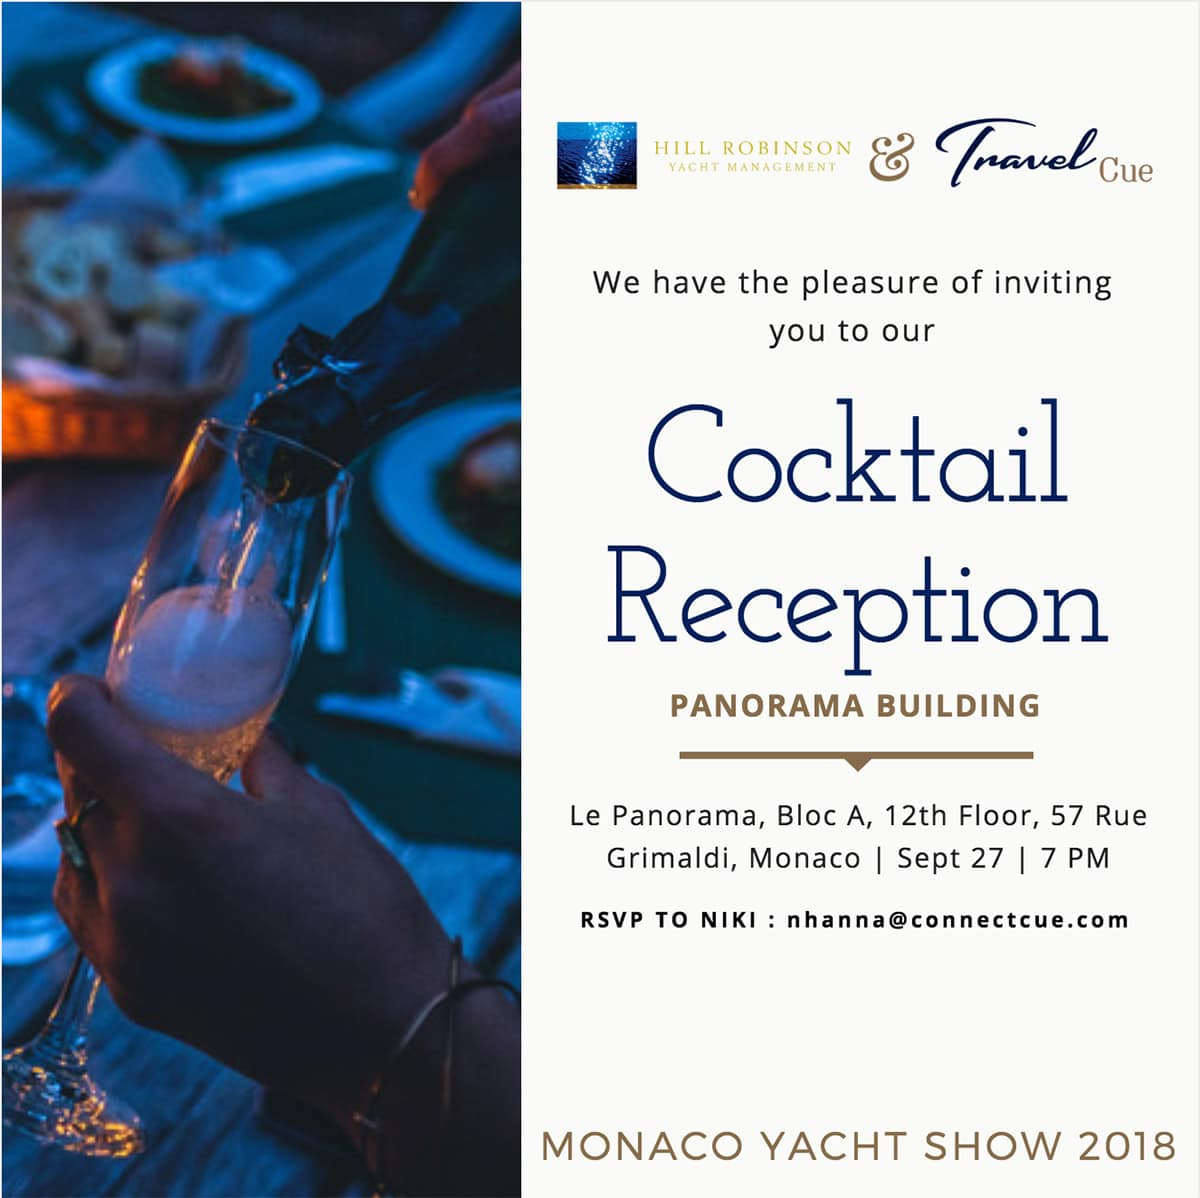 Monaco Yacht Show Cocktail Reception